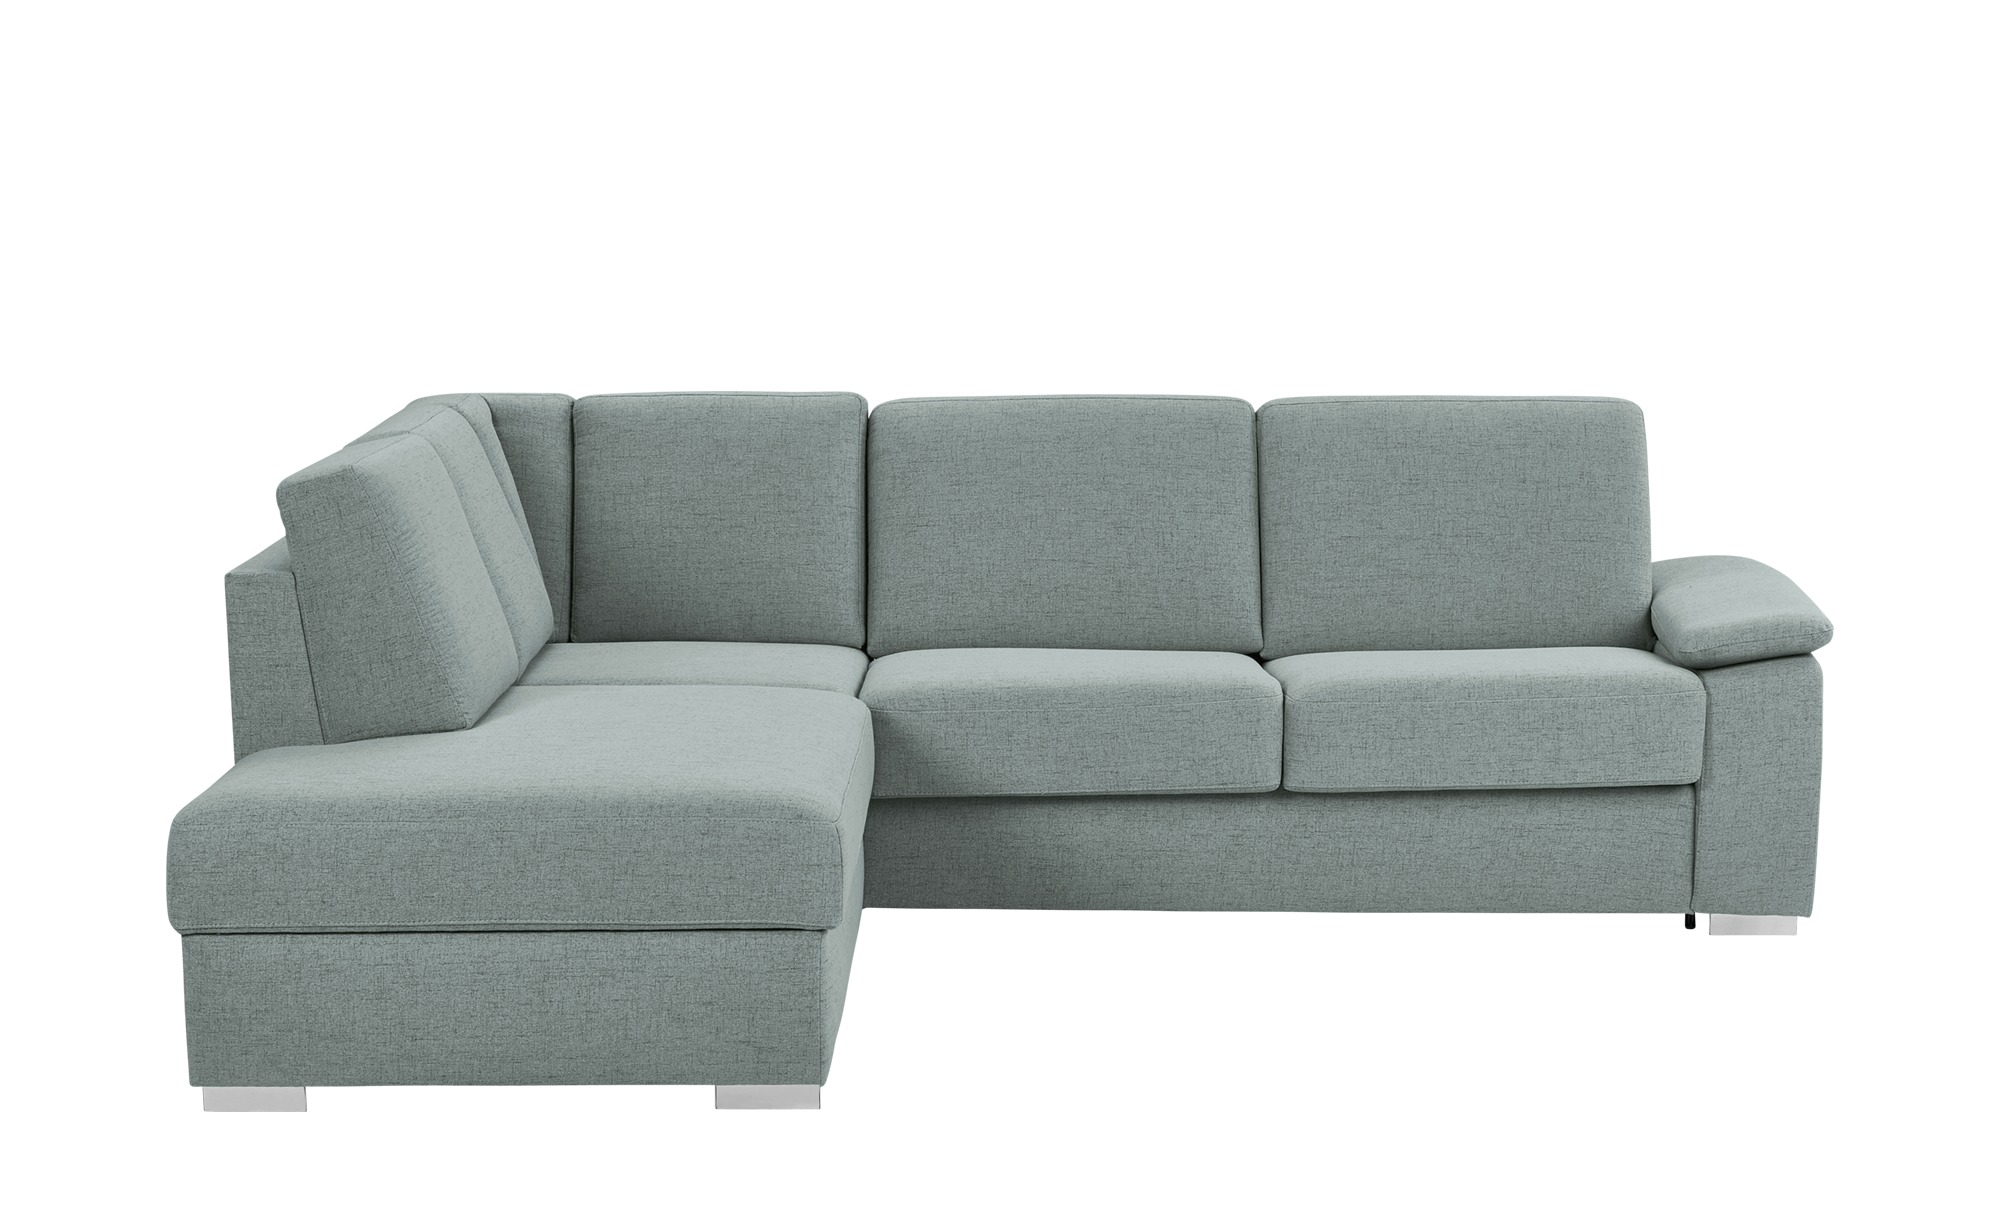 Ecksofa Grau Webstoff Betty Ecksofa Sofa Couch